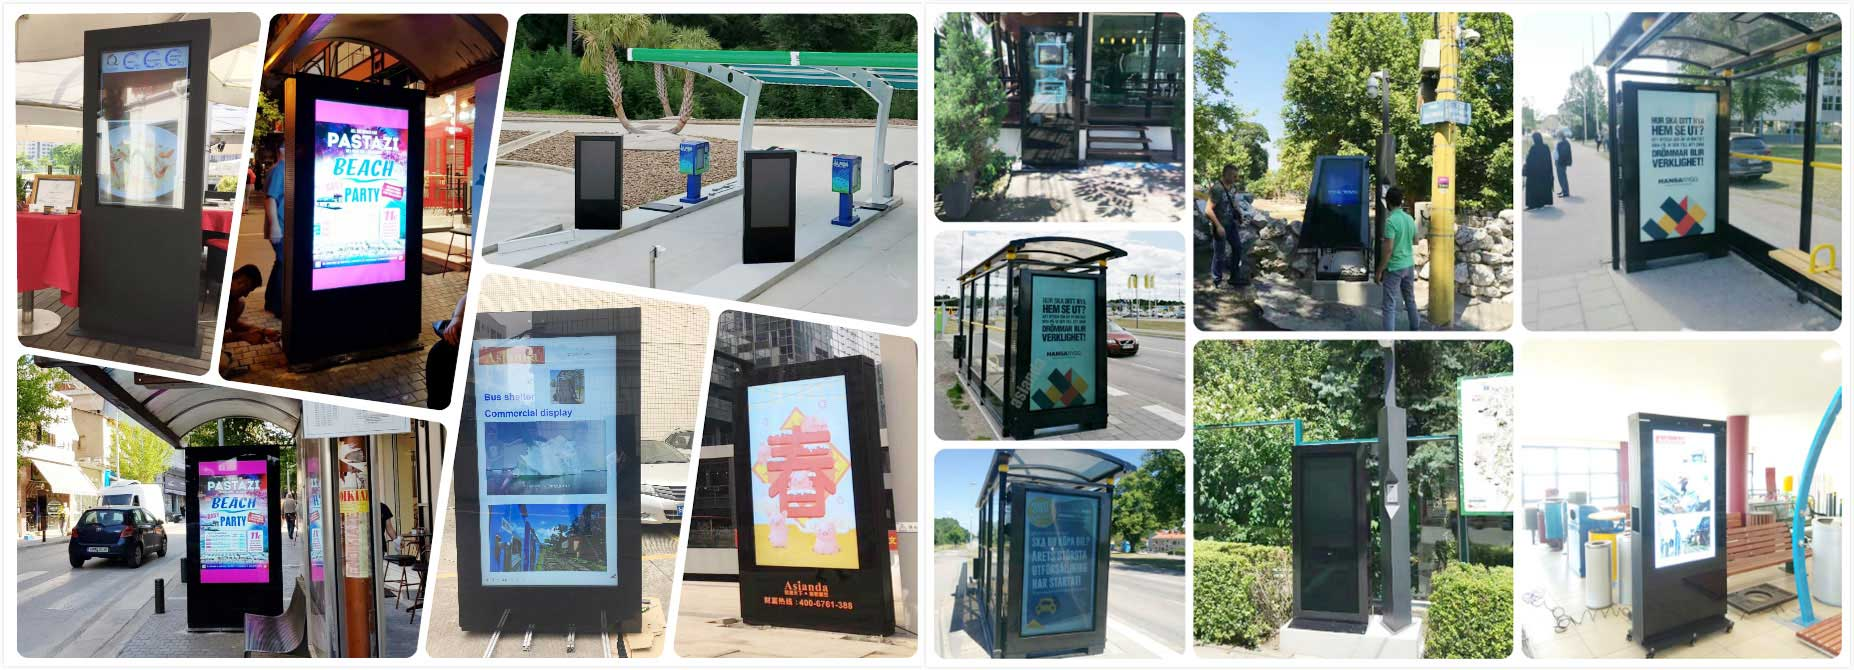 outdoor digital signage kiosk display